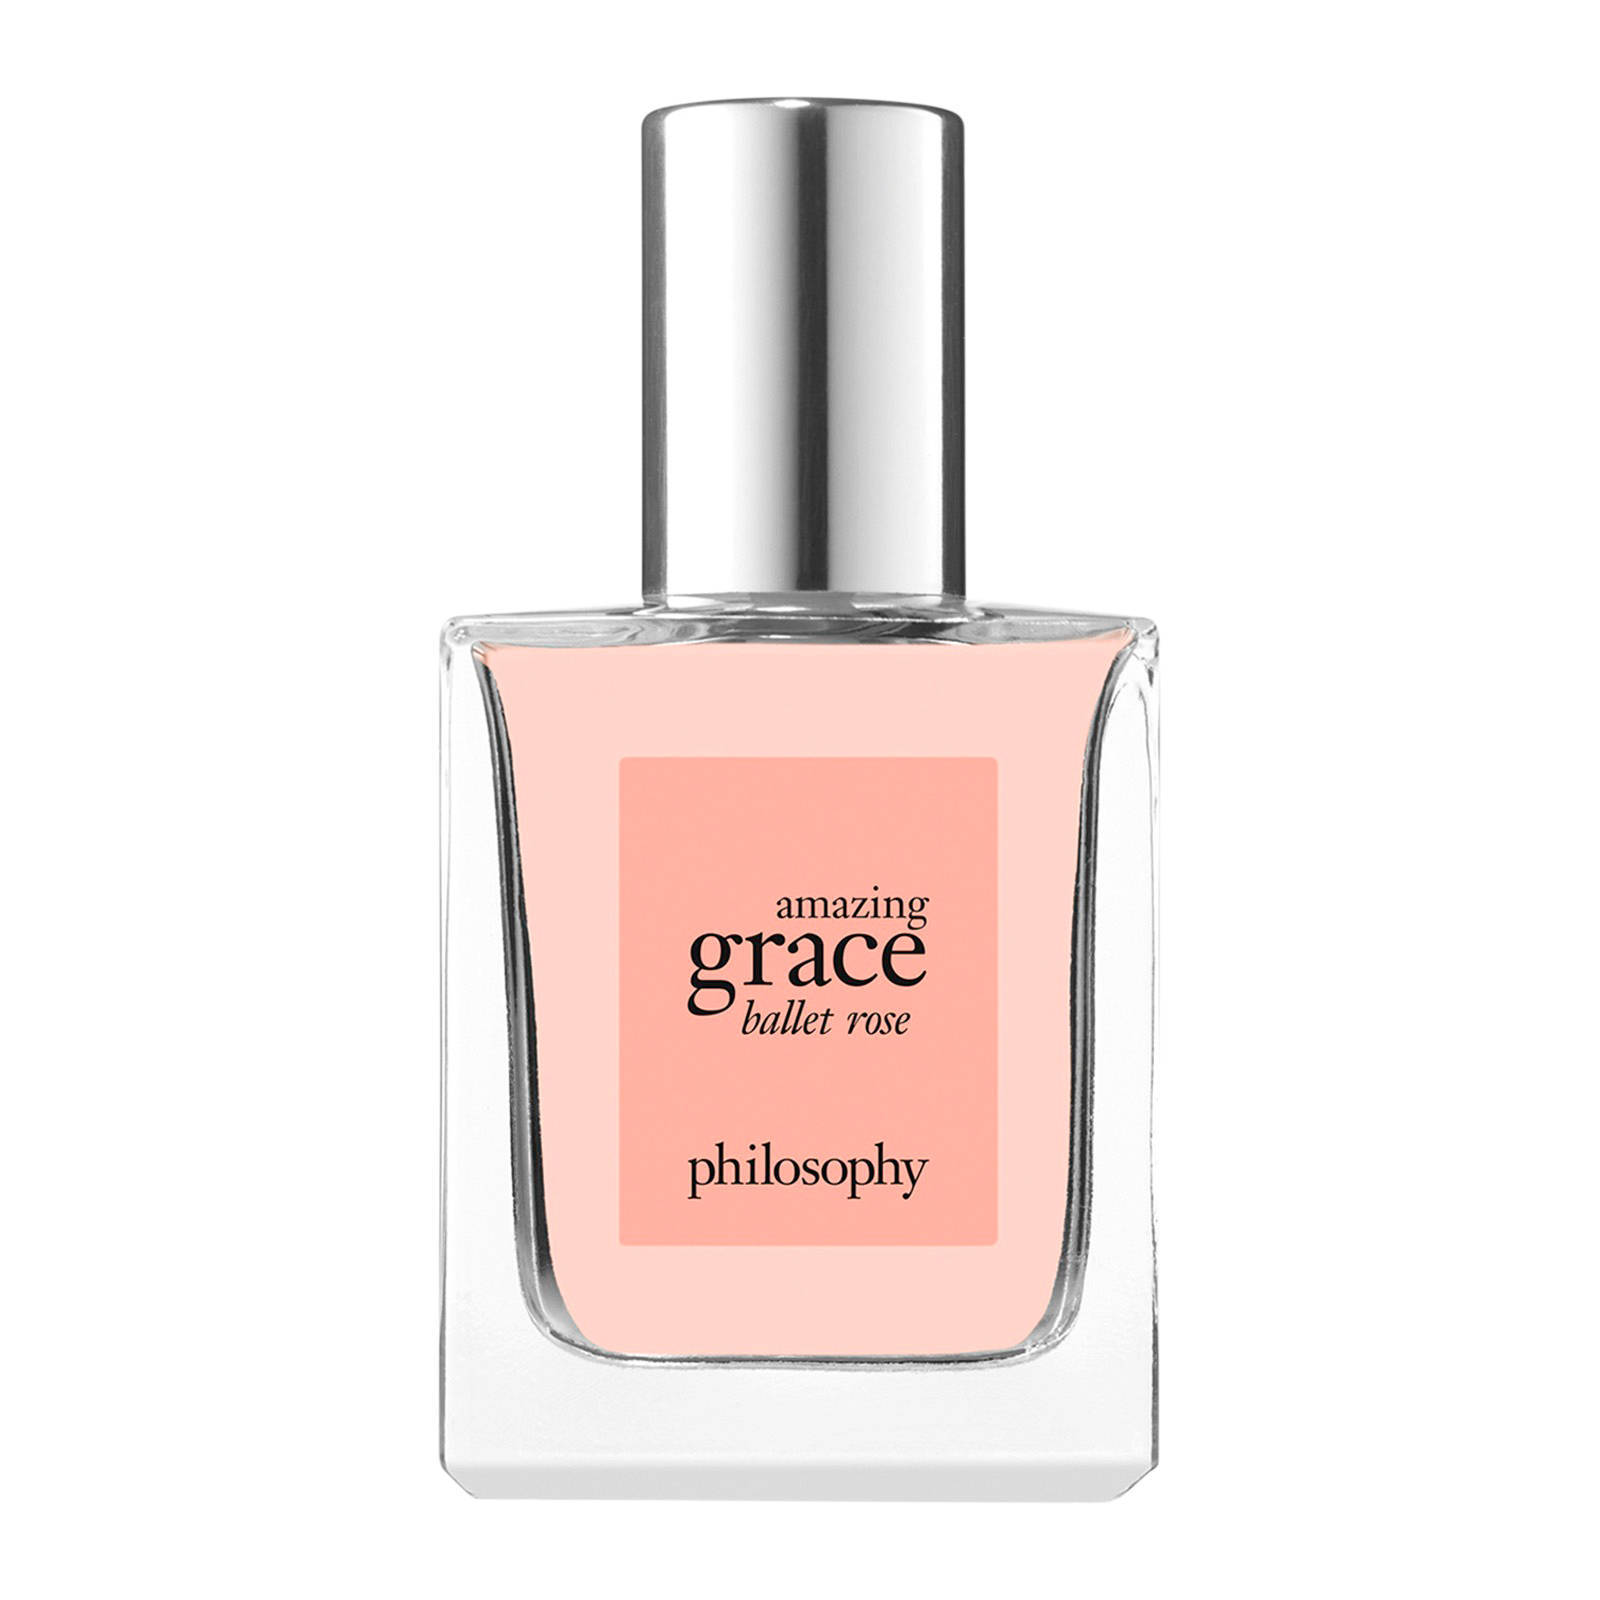 Bij Wehkamp Parfum Bezorging Op 20 Tot 70Korting Gratis Vanaf 4RL3j5cAq